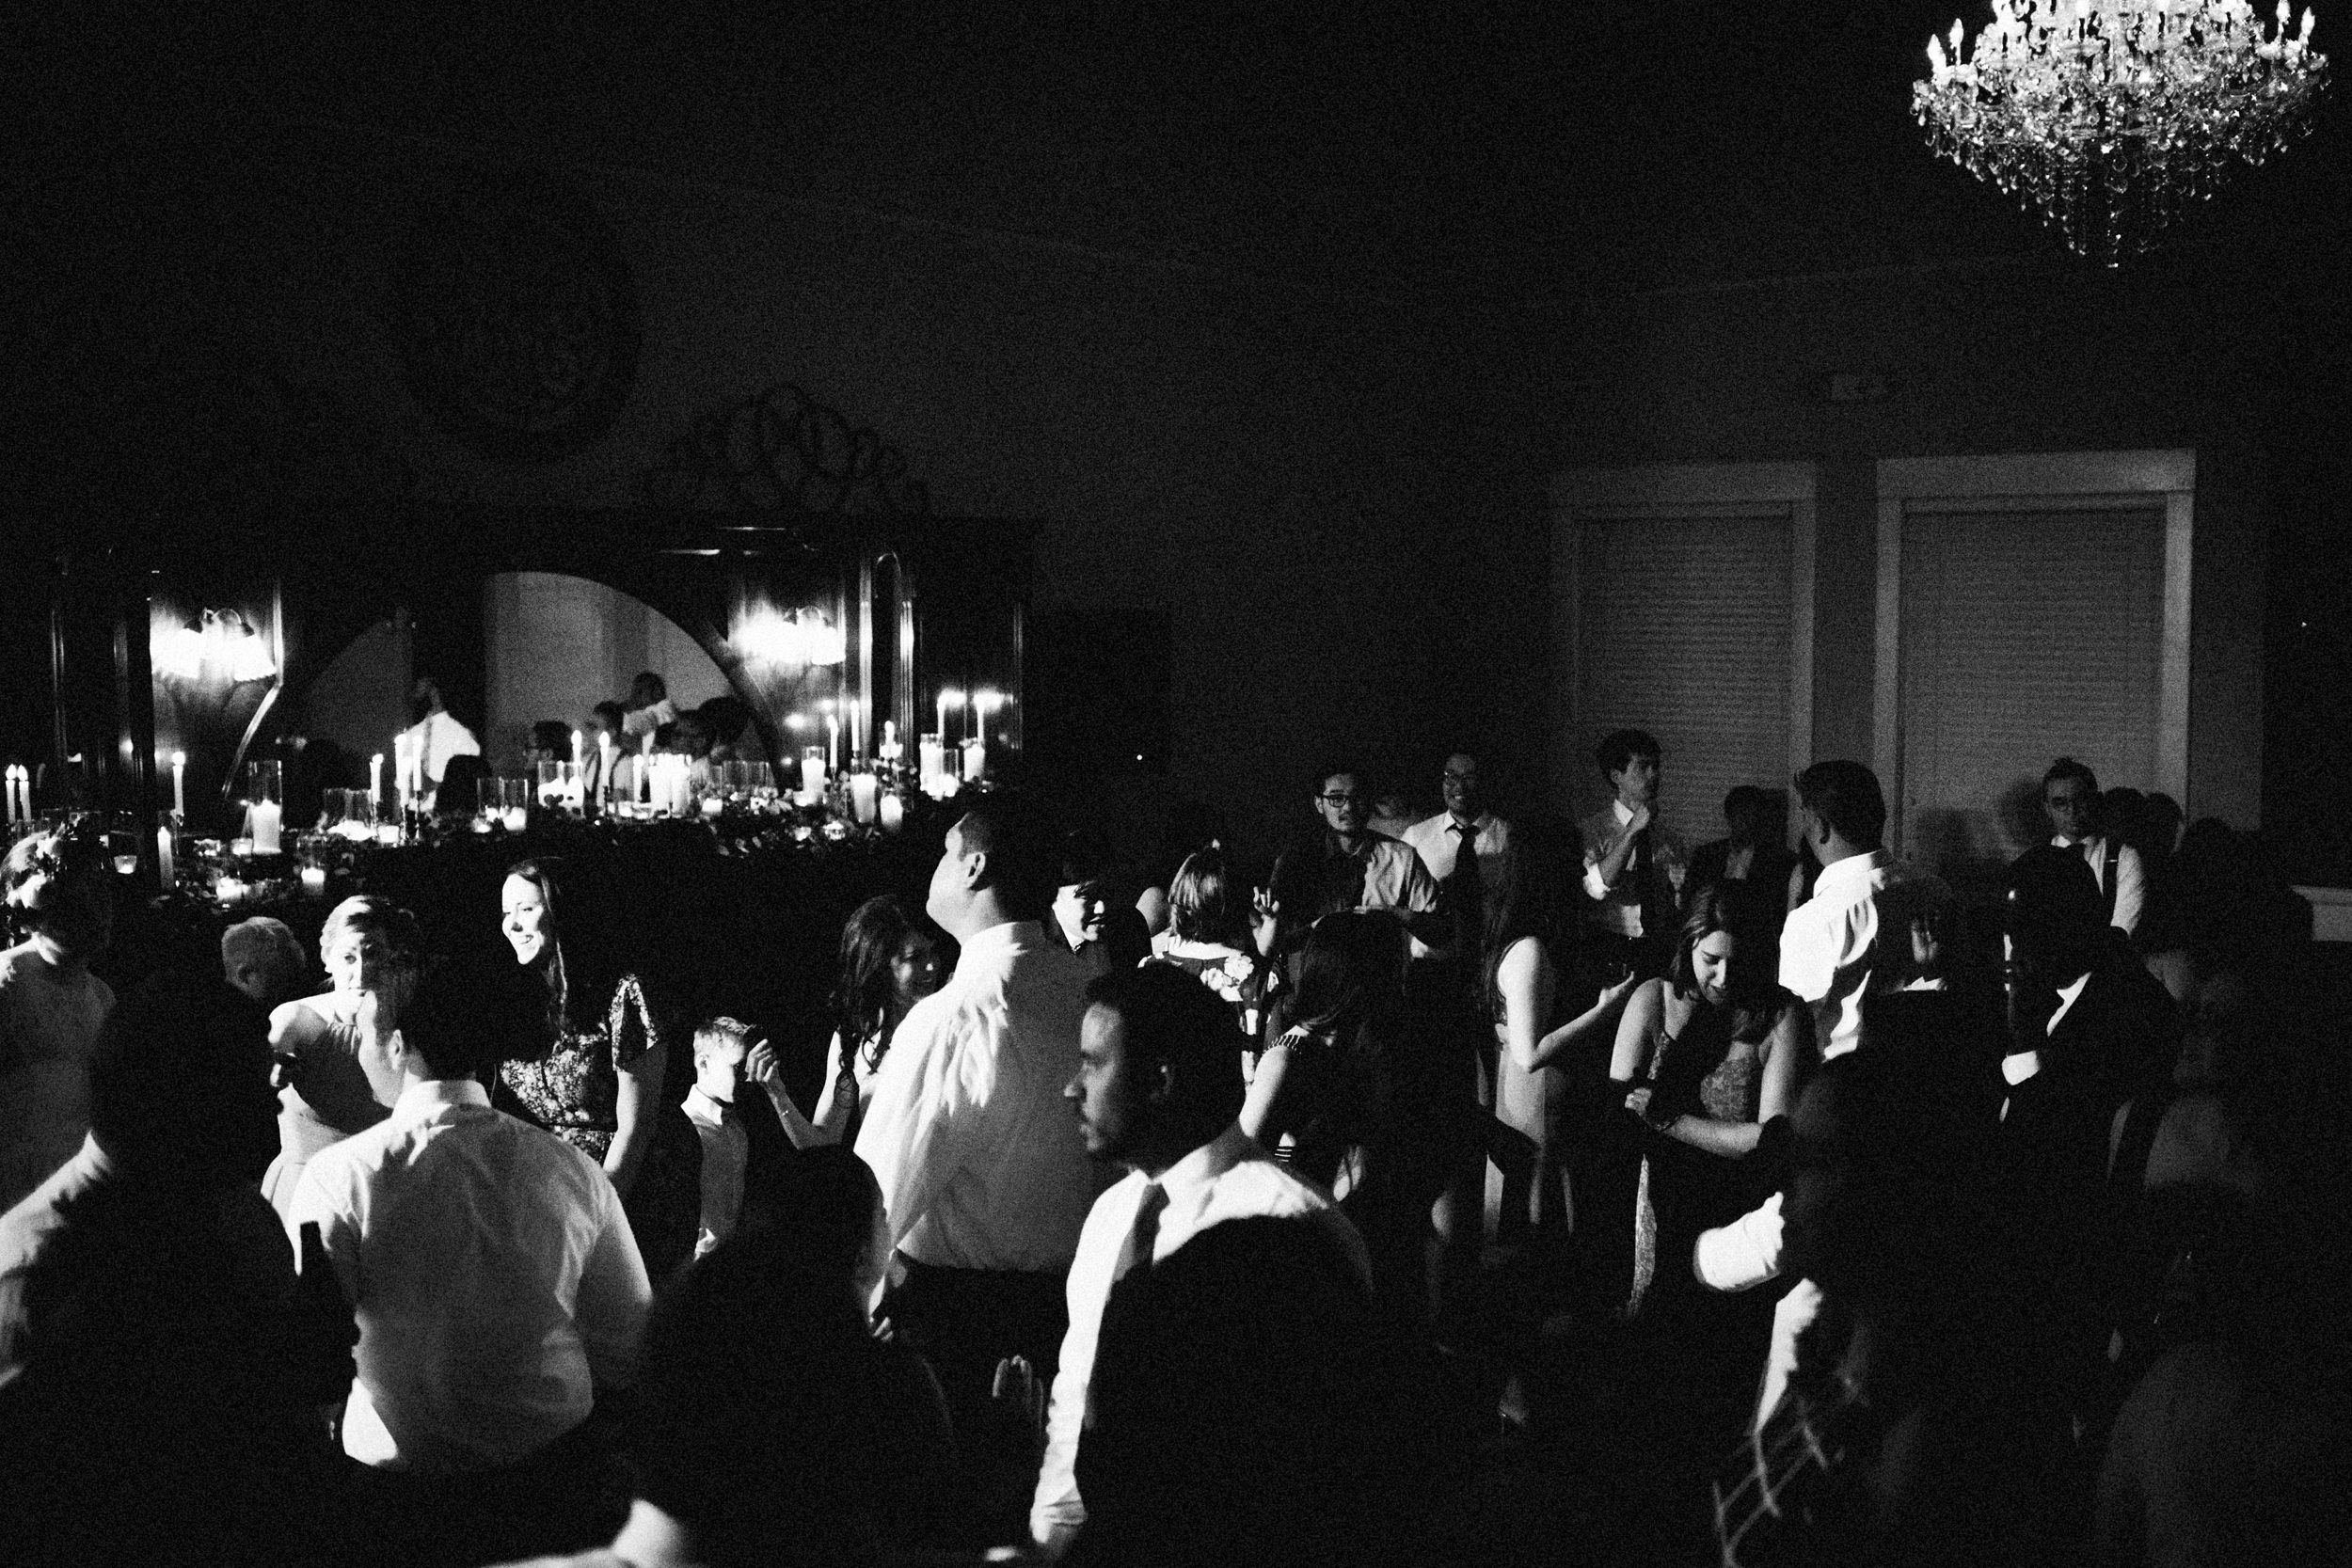 lauren-dean-wedding-grand-lodge-kentucky-sarah-katherine-davis-photography-694edit.jpg